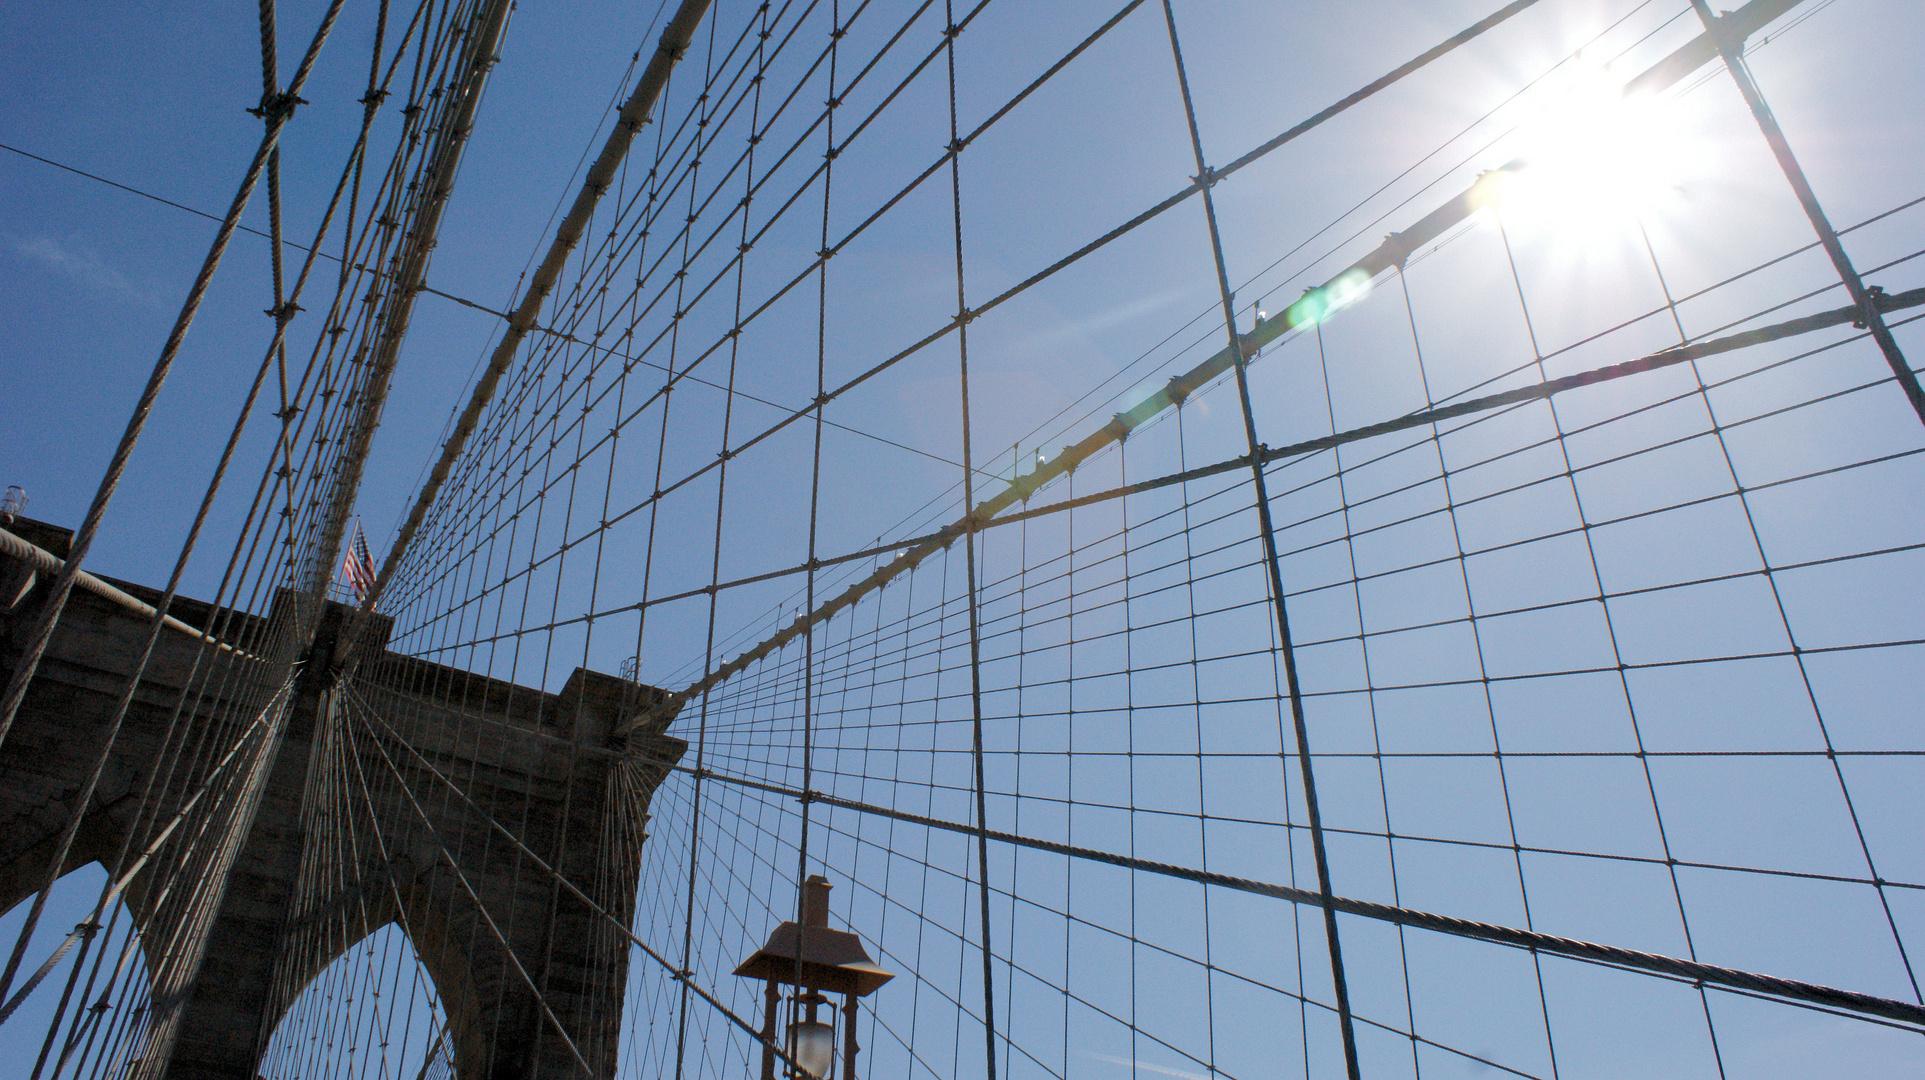 Brooklyn Bridge best weather